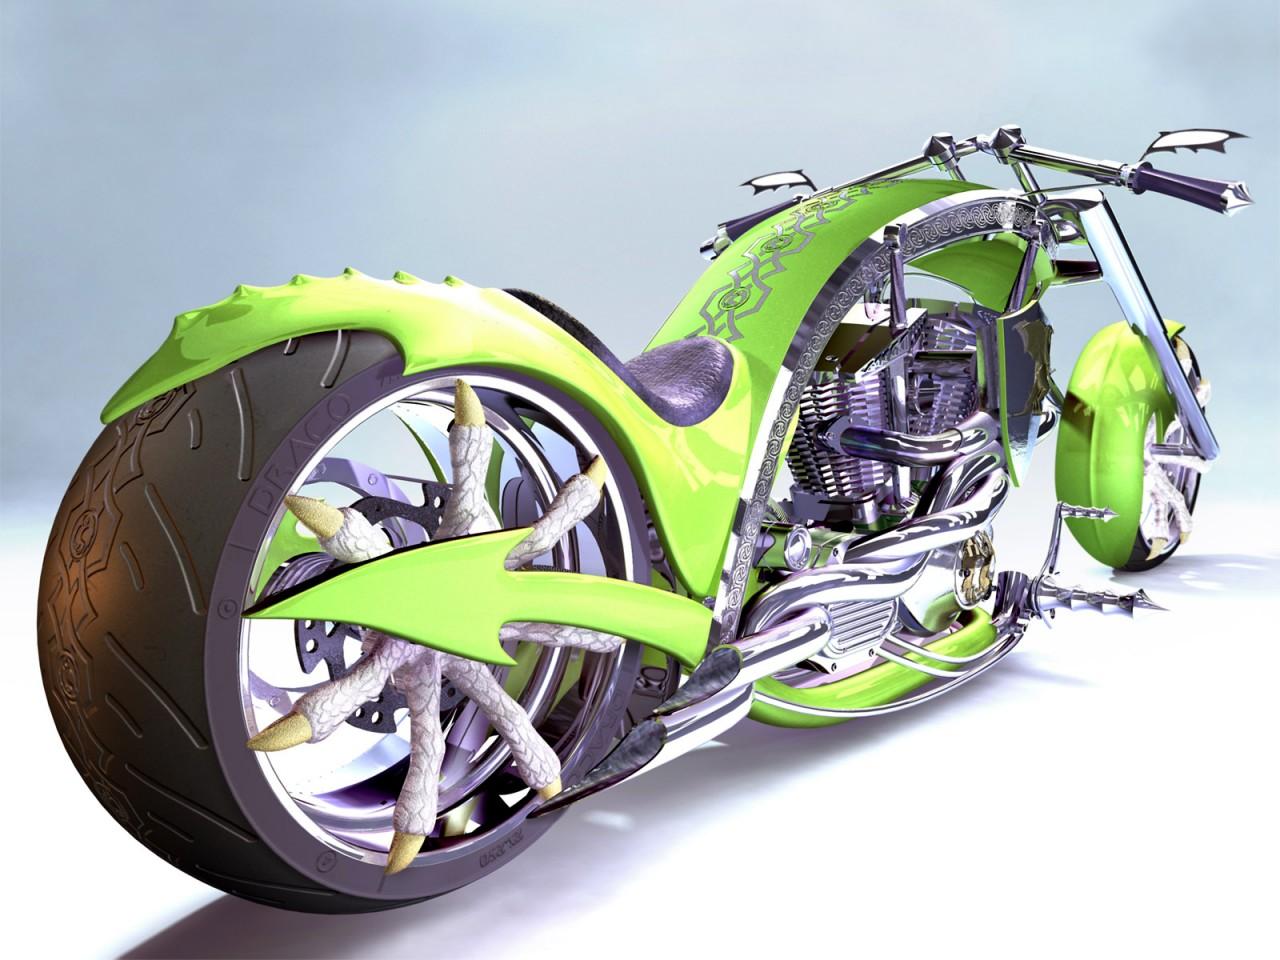 http://3.bp.blogspot.com/_I4aGt6FbDTQ/S7OMoe10KzI/AAAAAAAAASc/w6UlhhmpeR4/s1600/dragon_chopper-1280x960.jpg